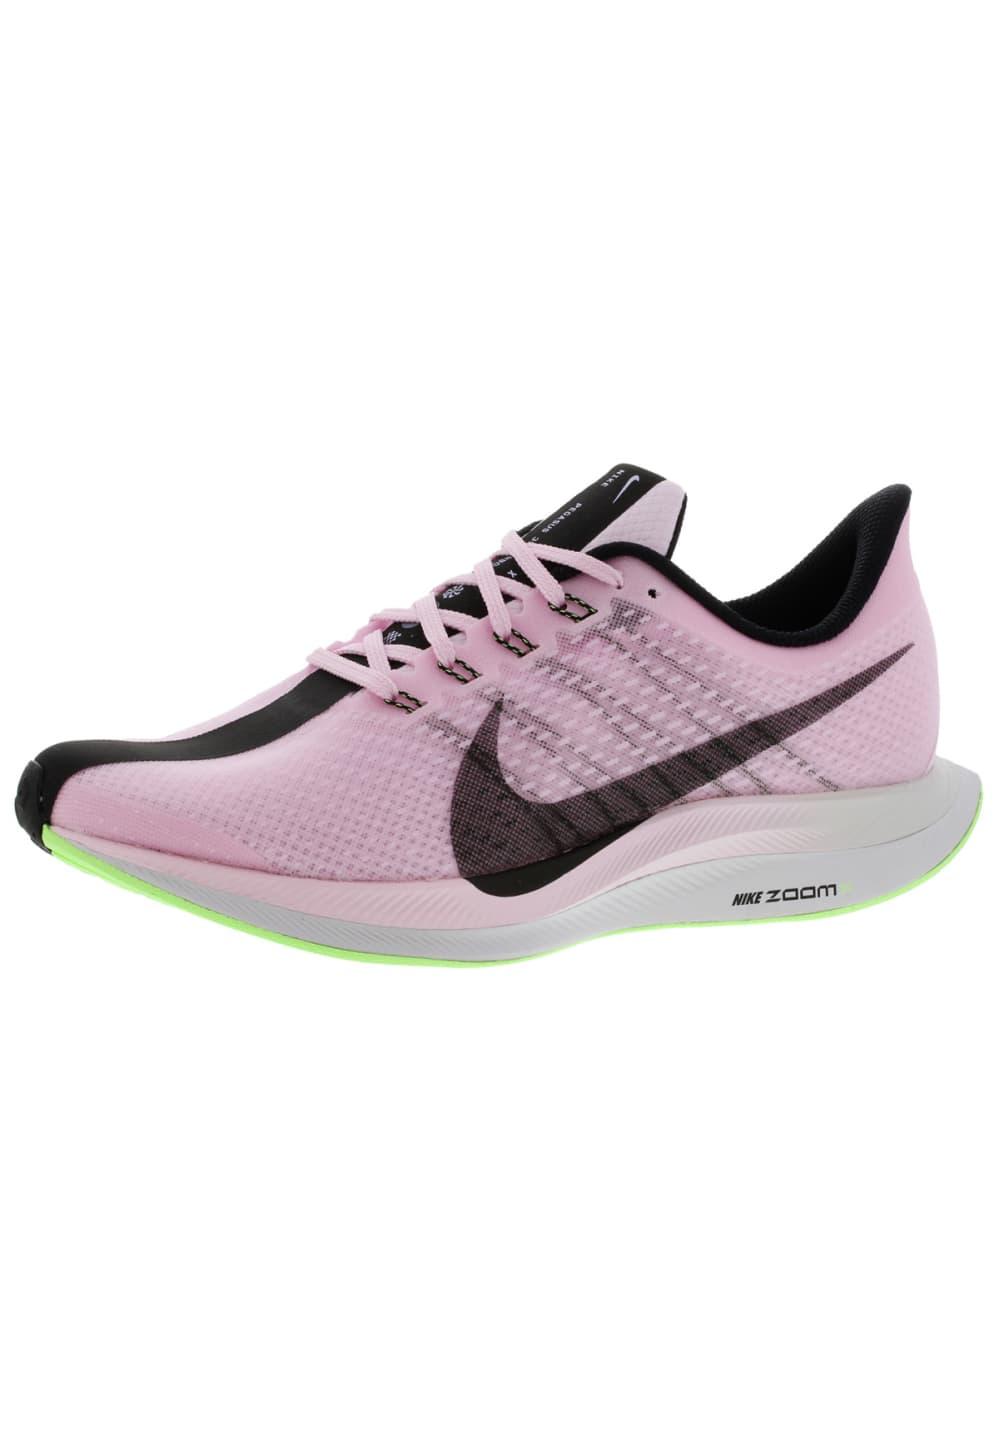 revendeur 85196 60df7 Nike Zoom Pegasus Turbo - Running shoes for Women - Pink